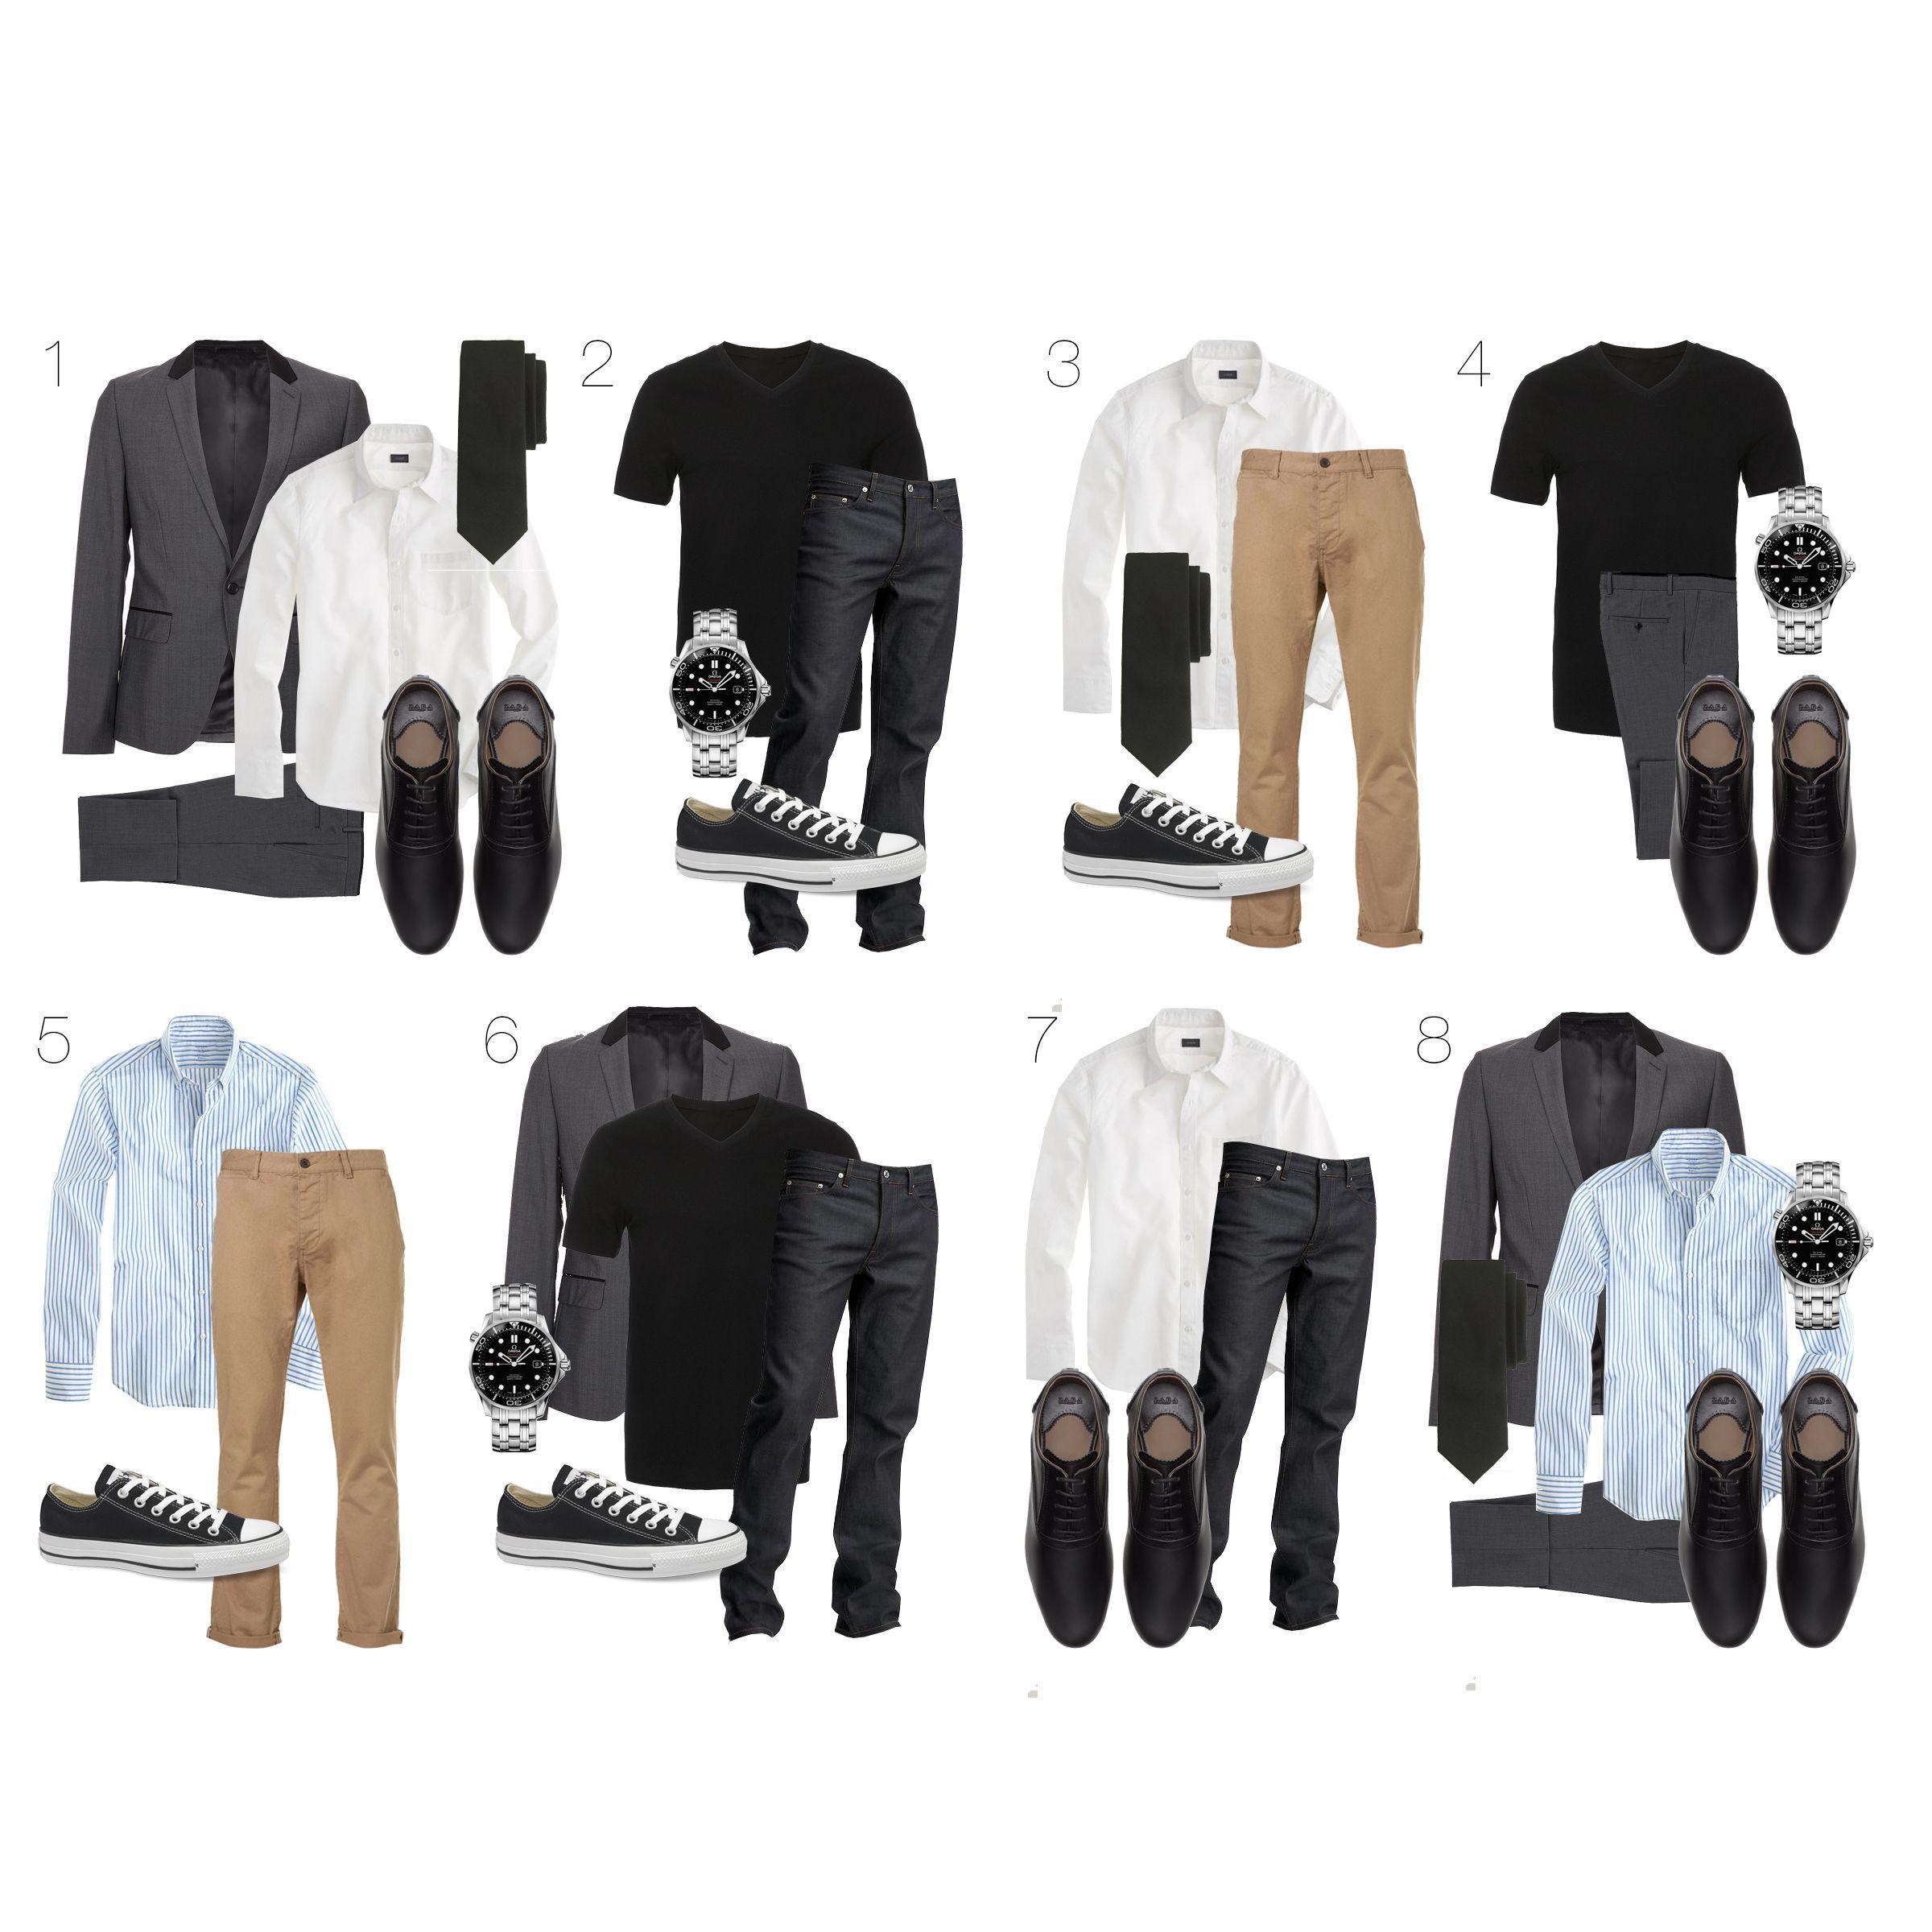 Wardrobe Essentials Part II | Top ten, Wardrobes and ...